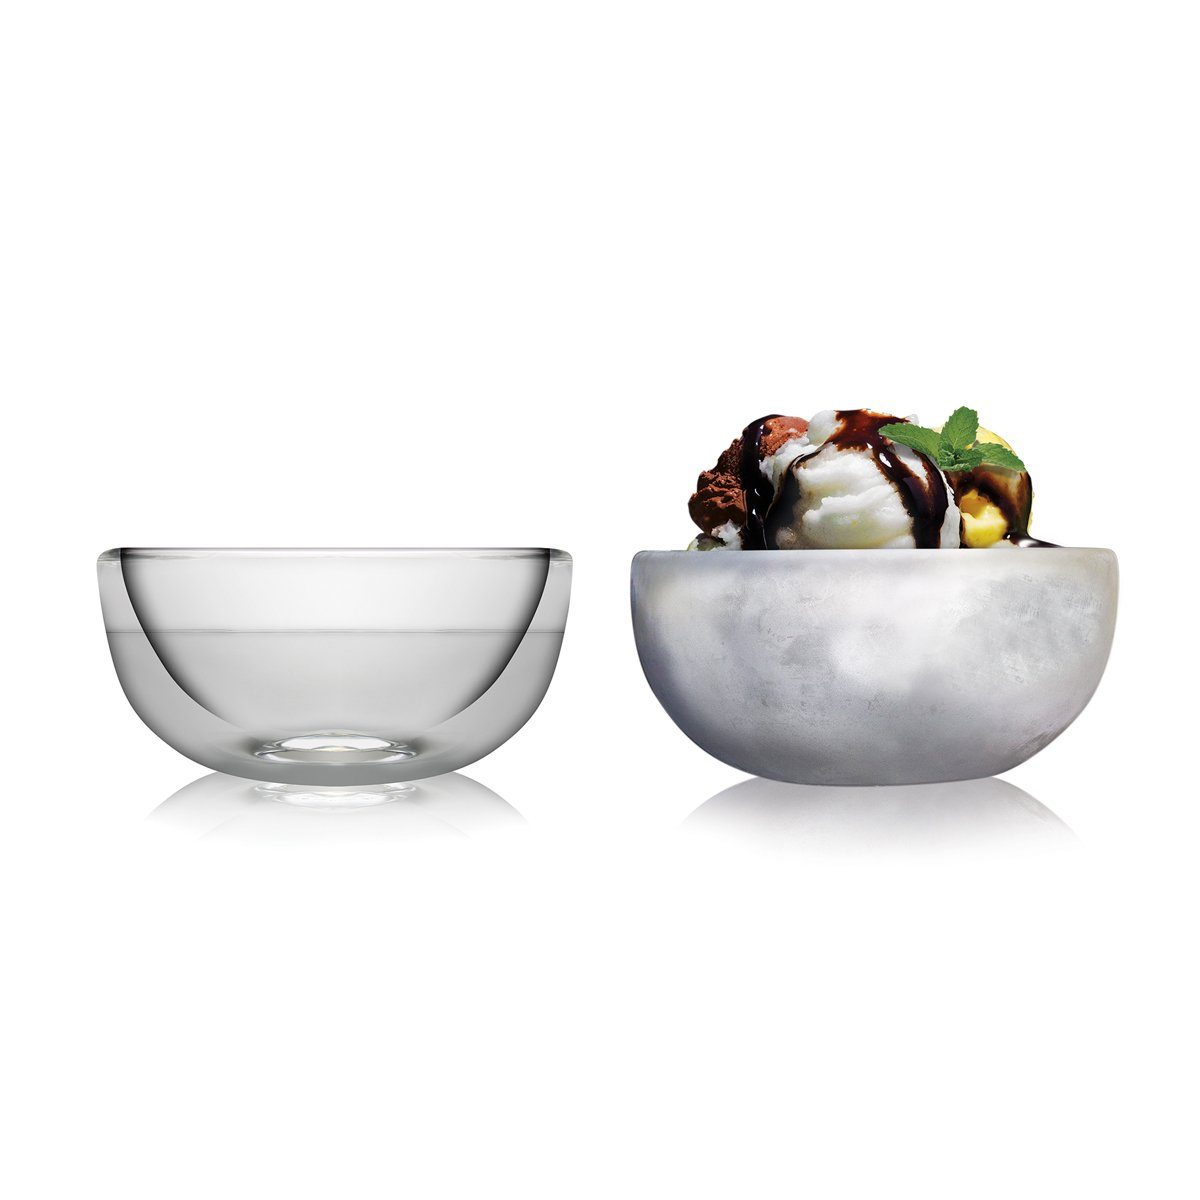 Amsterdam Glass Amsterdam Glass Schale 0.29 Liter, 2er Set